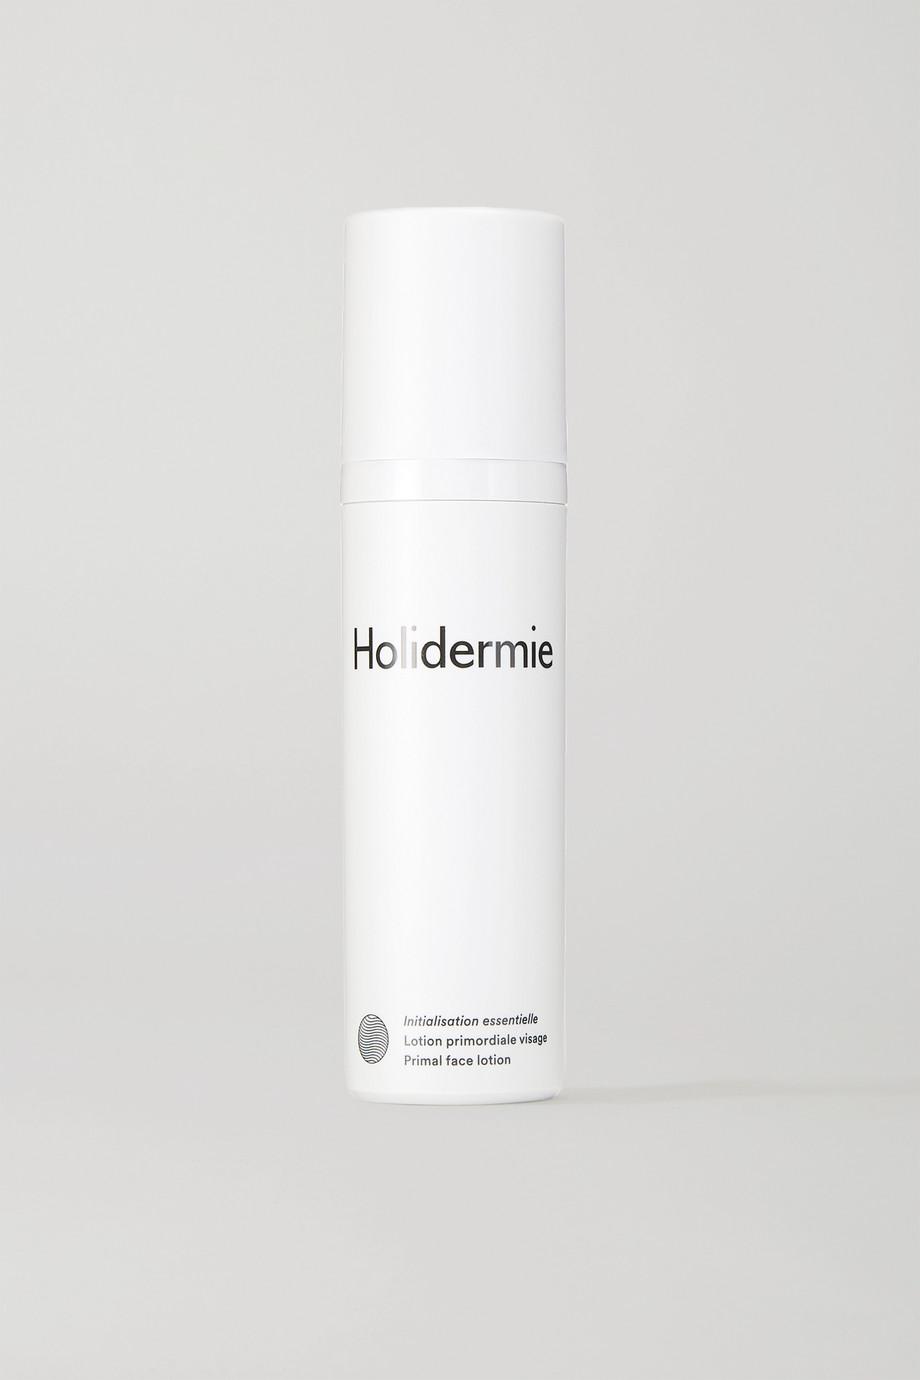 Holidermie Initialisation Essentielle Primal Face Lotion, 75 ml – Gesichtslotion